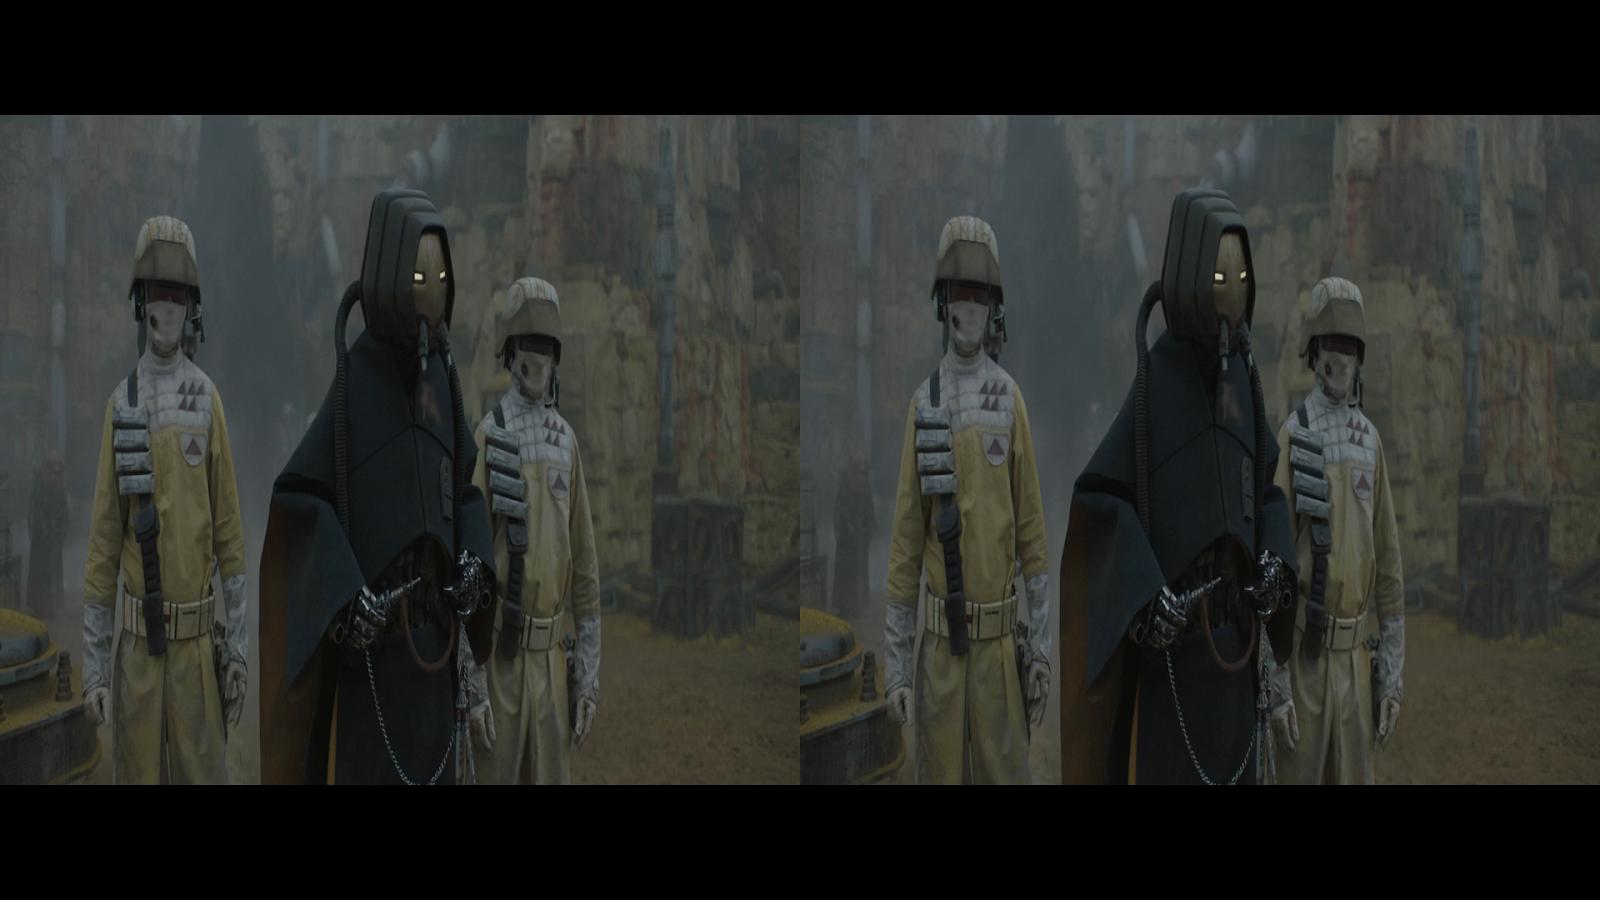 Han Solo: Una historia de Star Wars (2018) 3D SBS Full 1080p Latino-Castellano-Ingles captura 4